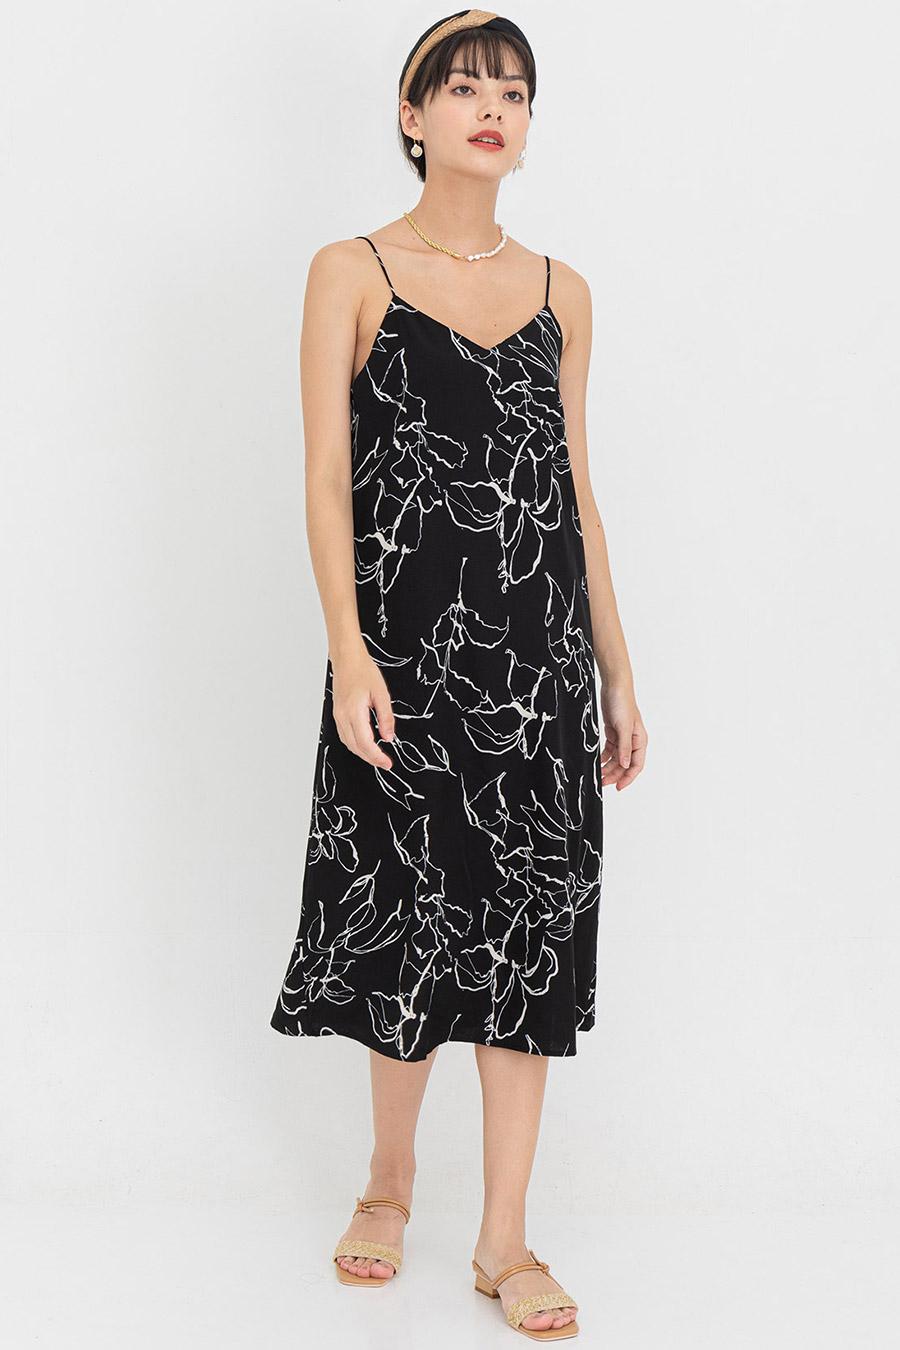 VALERIO DRESS - NOIR FLEUR